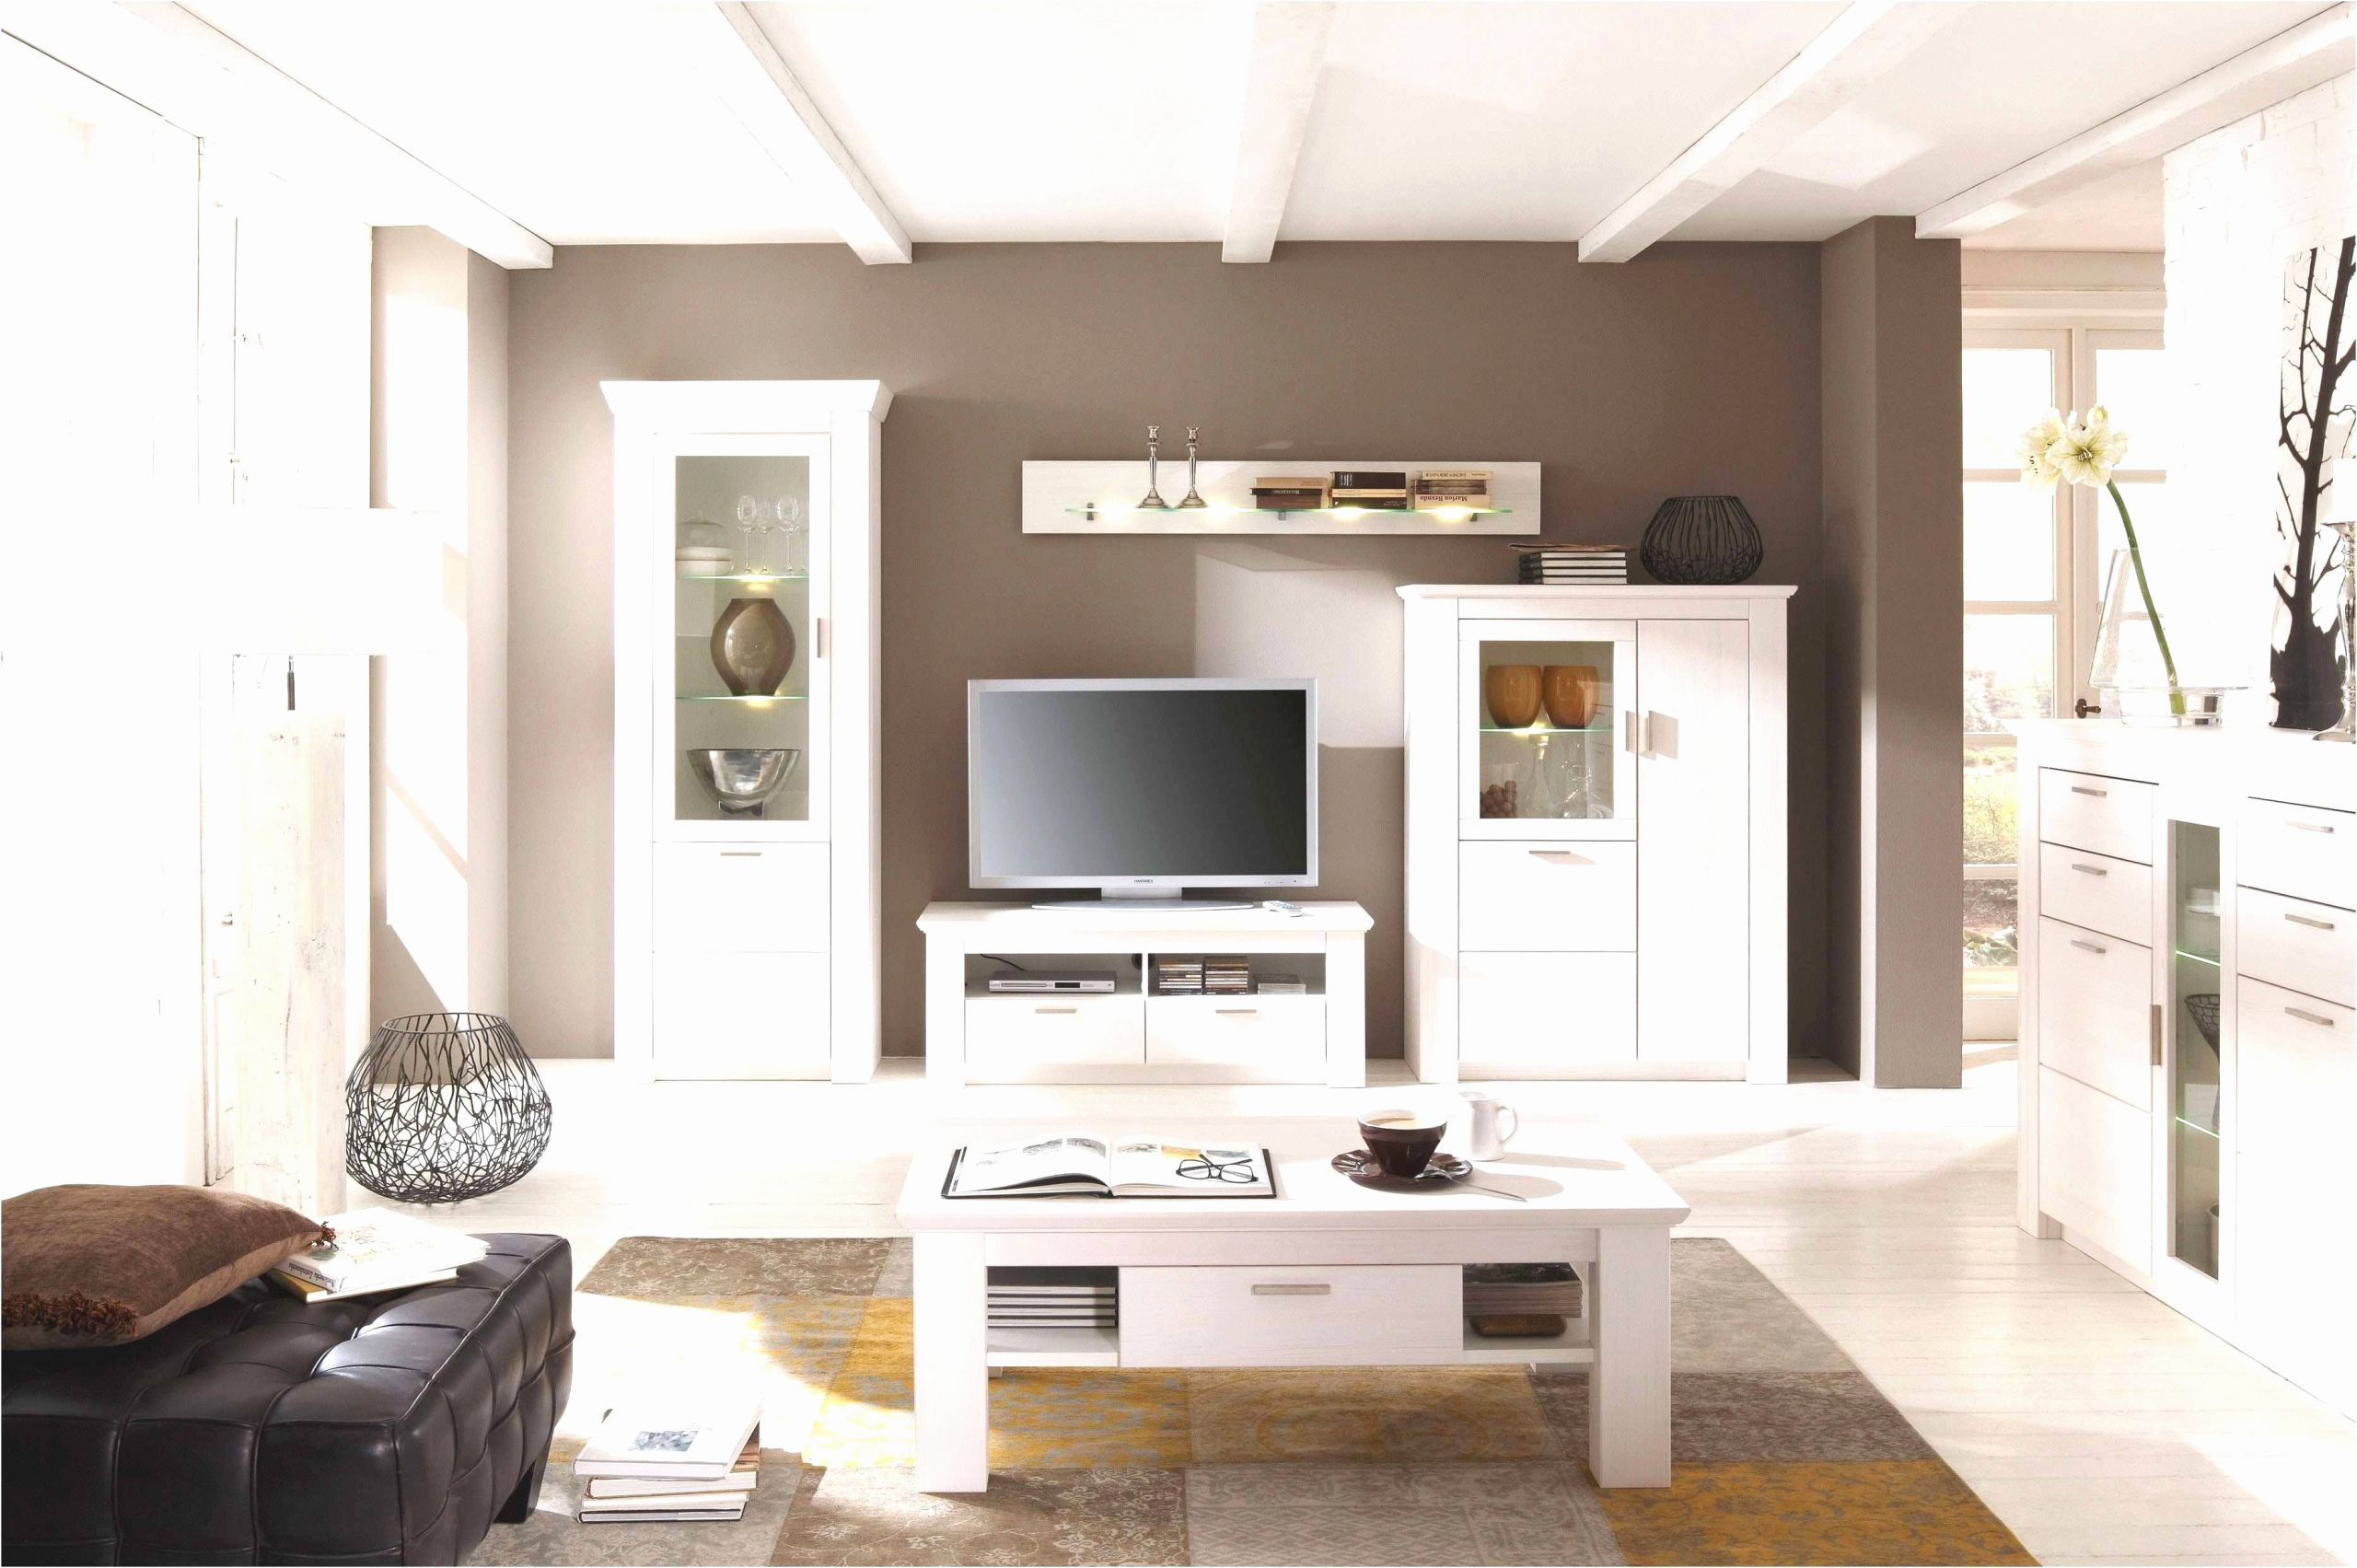 deko ideen furs kuchenfenster schon ausergewohnliche fenster deko ideen fur wohnzimmer of deko ideen furs kuchenfenster 1